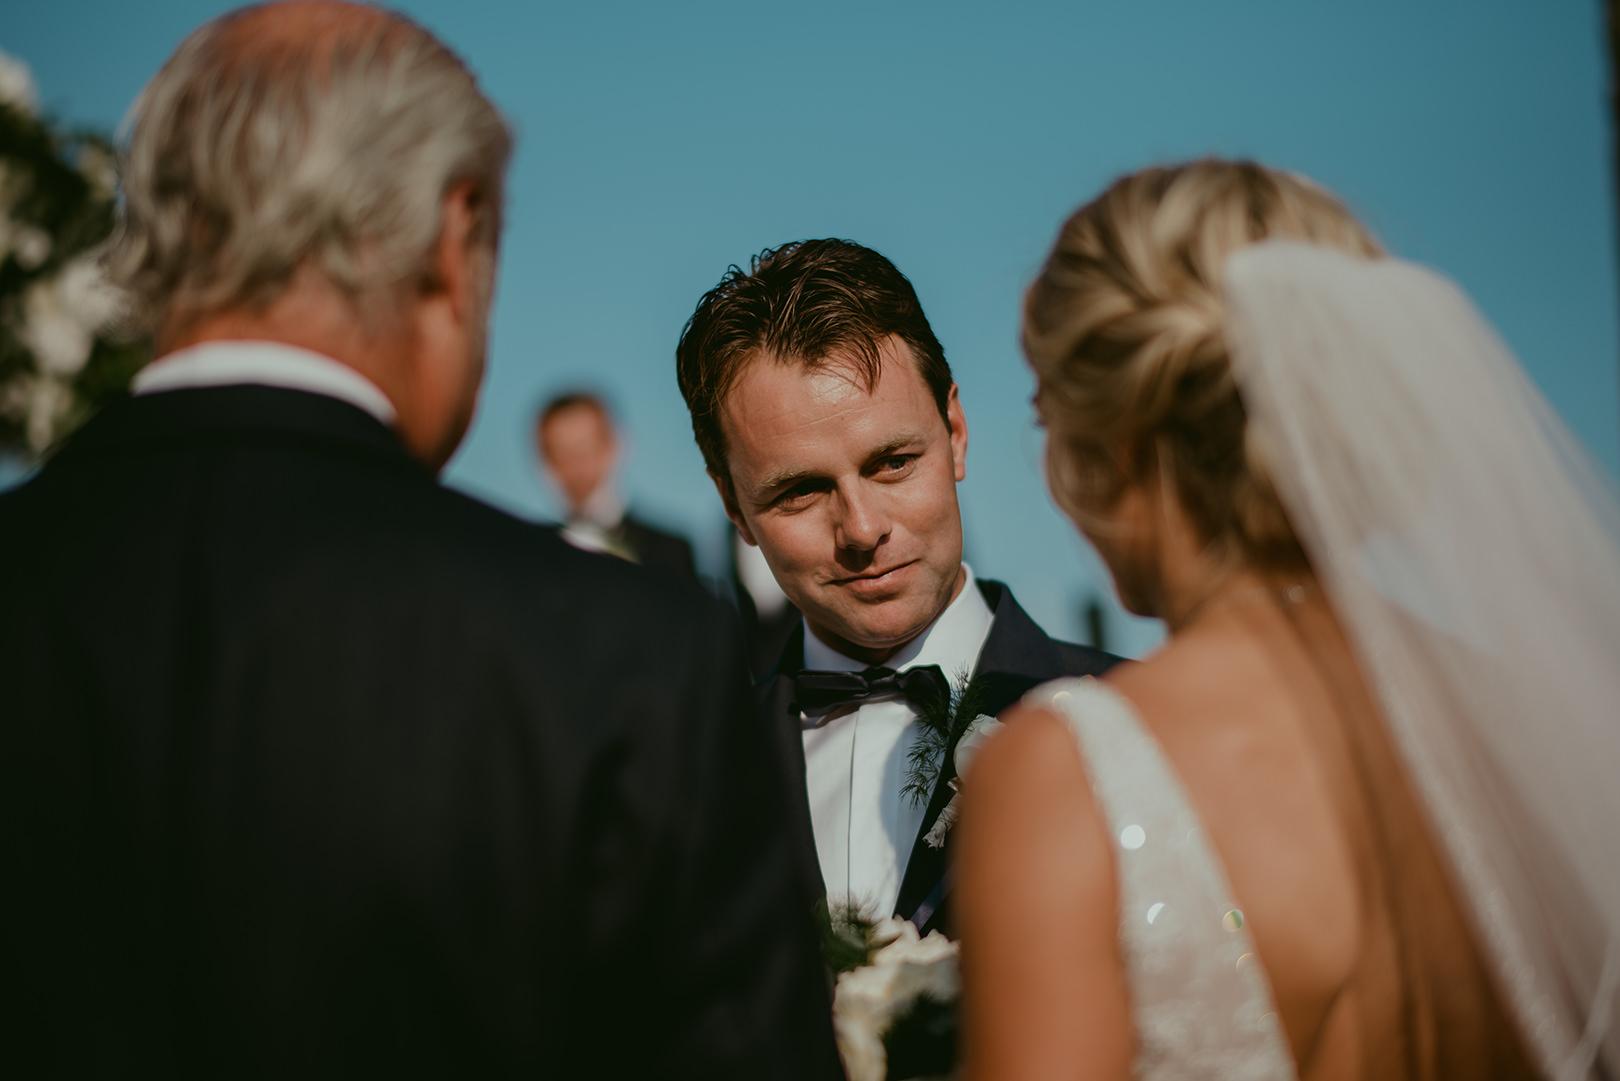 Bride meeting groom at Chateau de la Napoule wedding ceremony